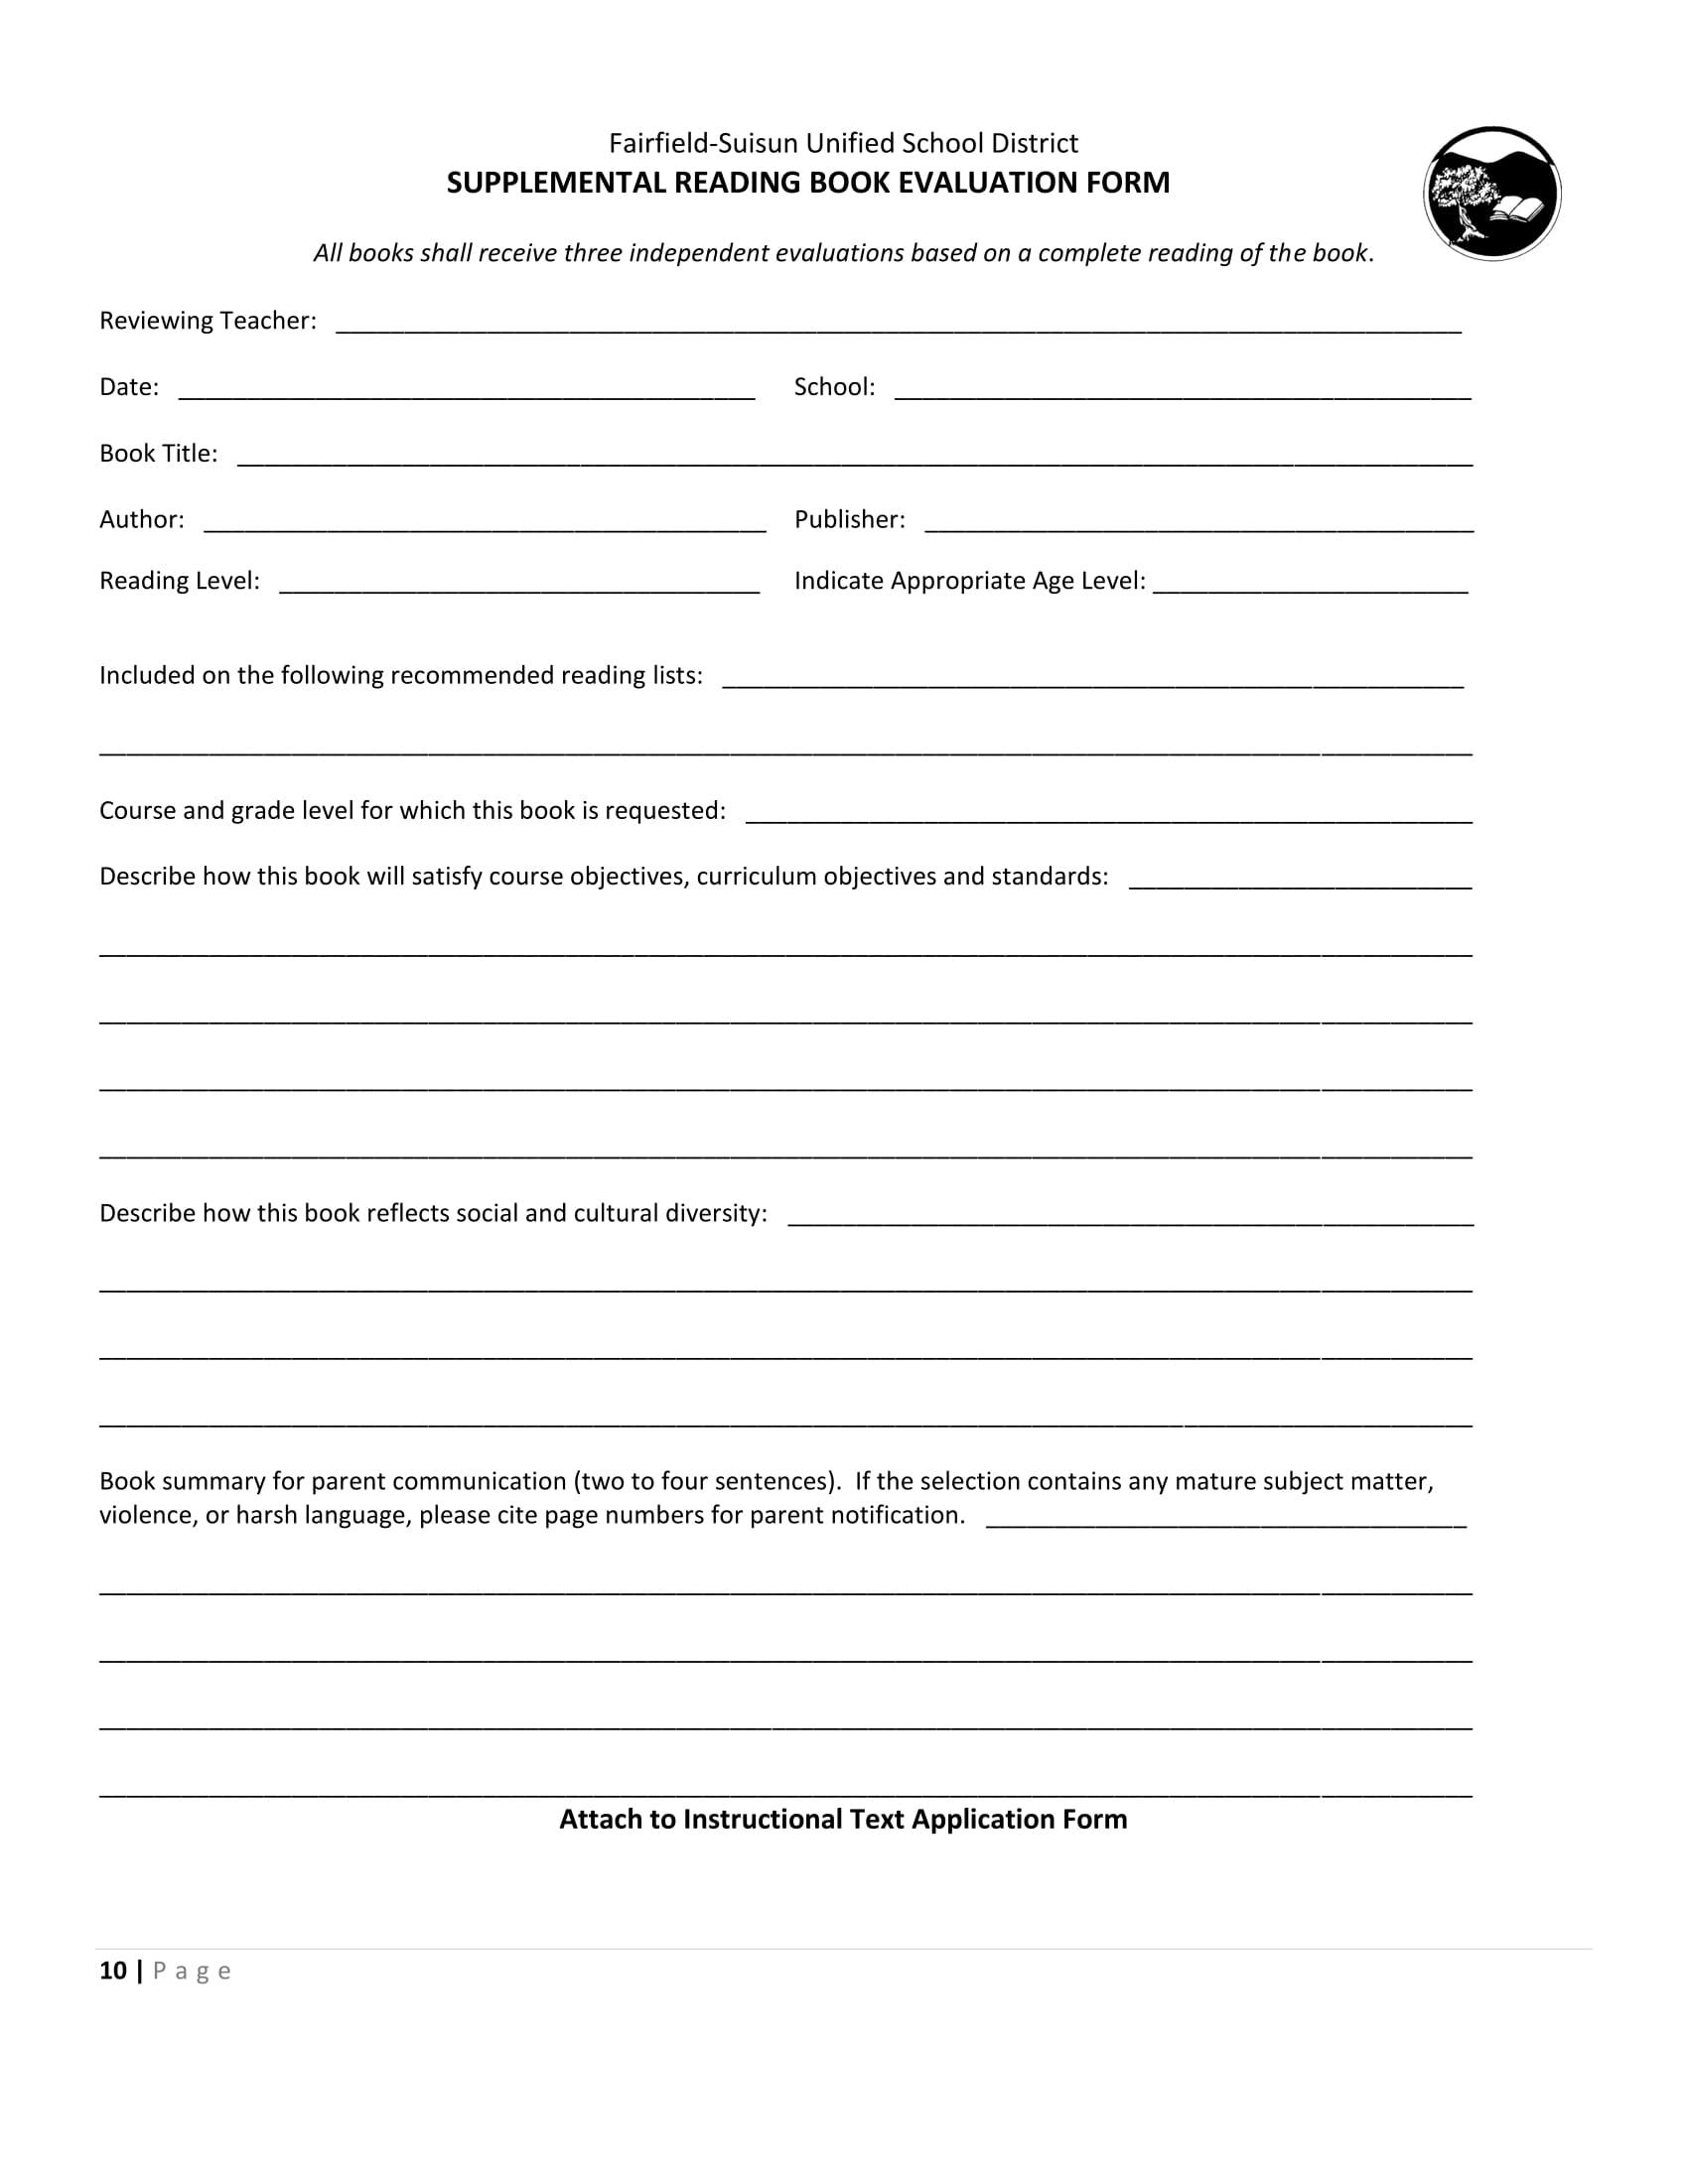 supplemental reading book evaluation form 1